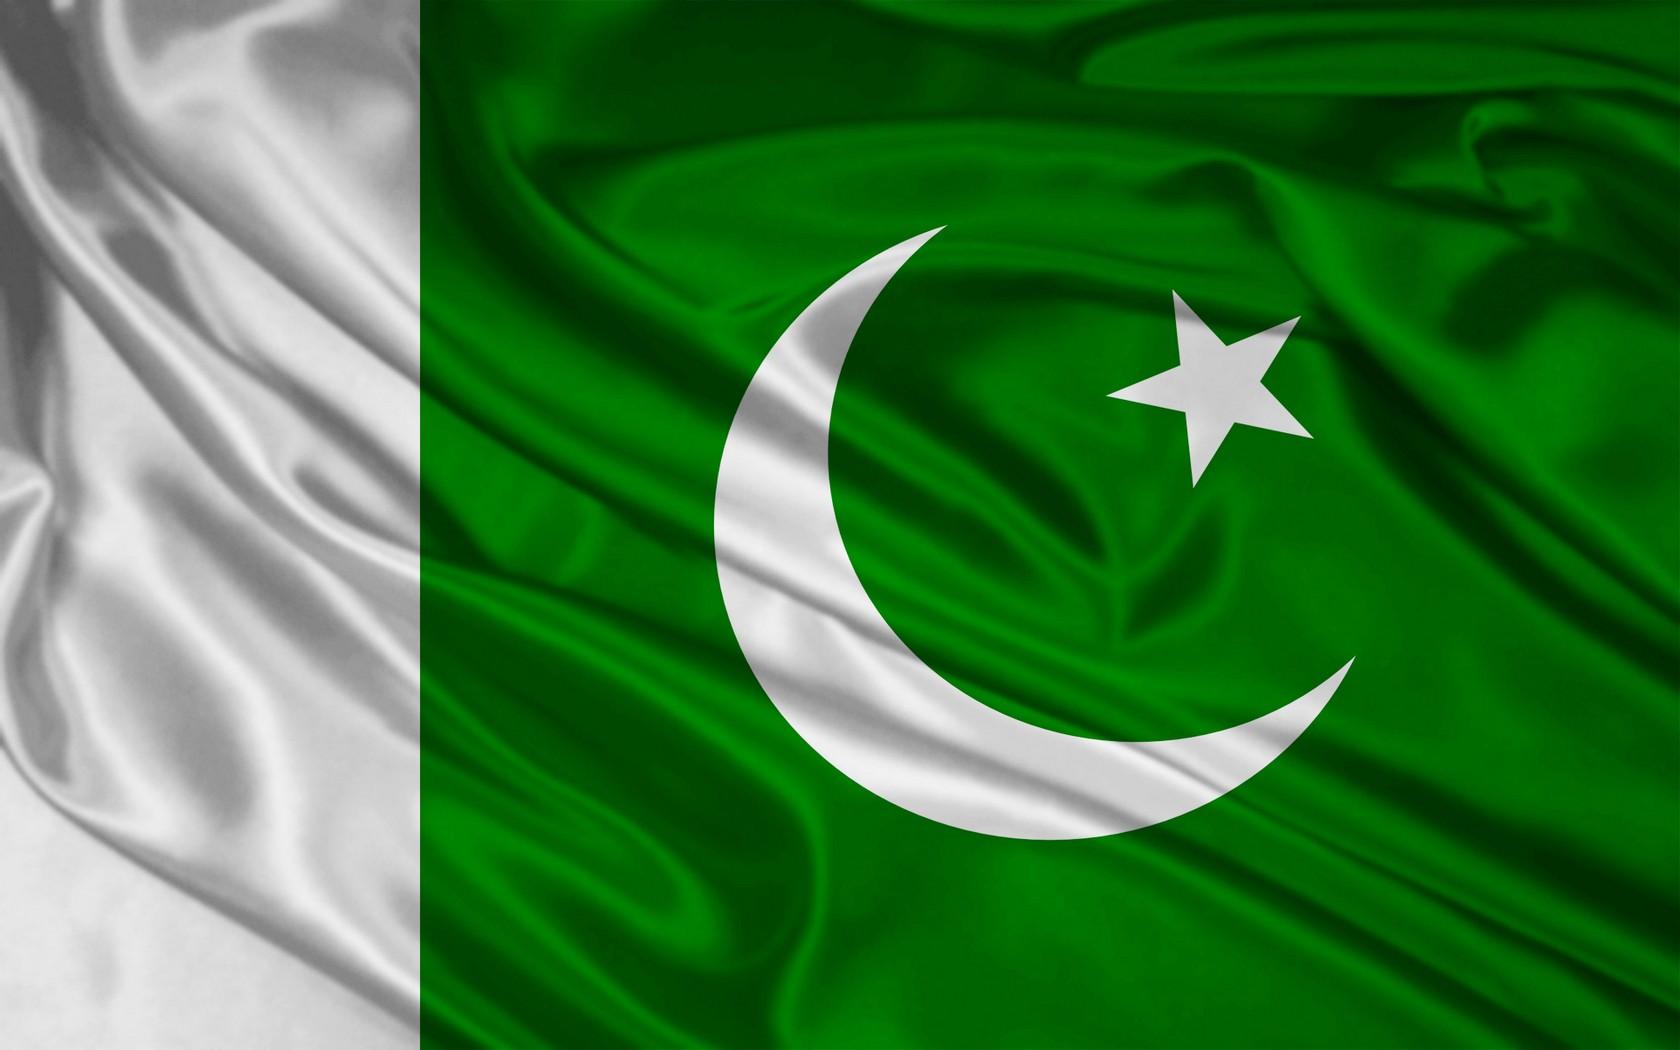 Flag Of Pakistan Backgrounds, Compatible - PC, Mobile, Gadgets| 1680x1050 px